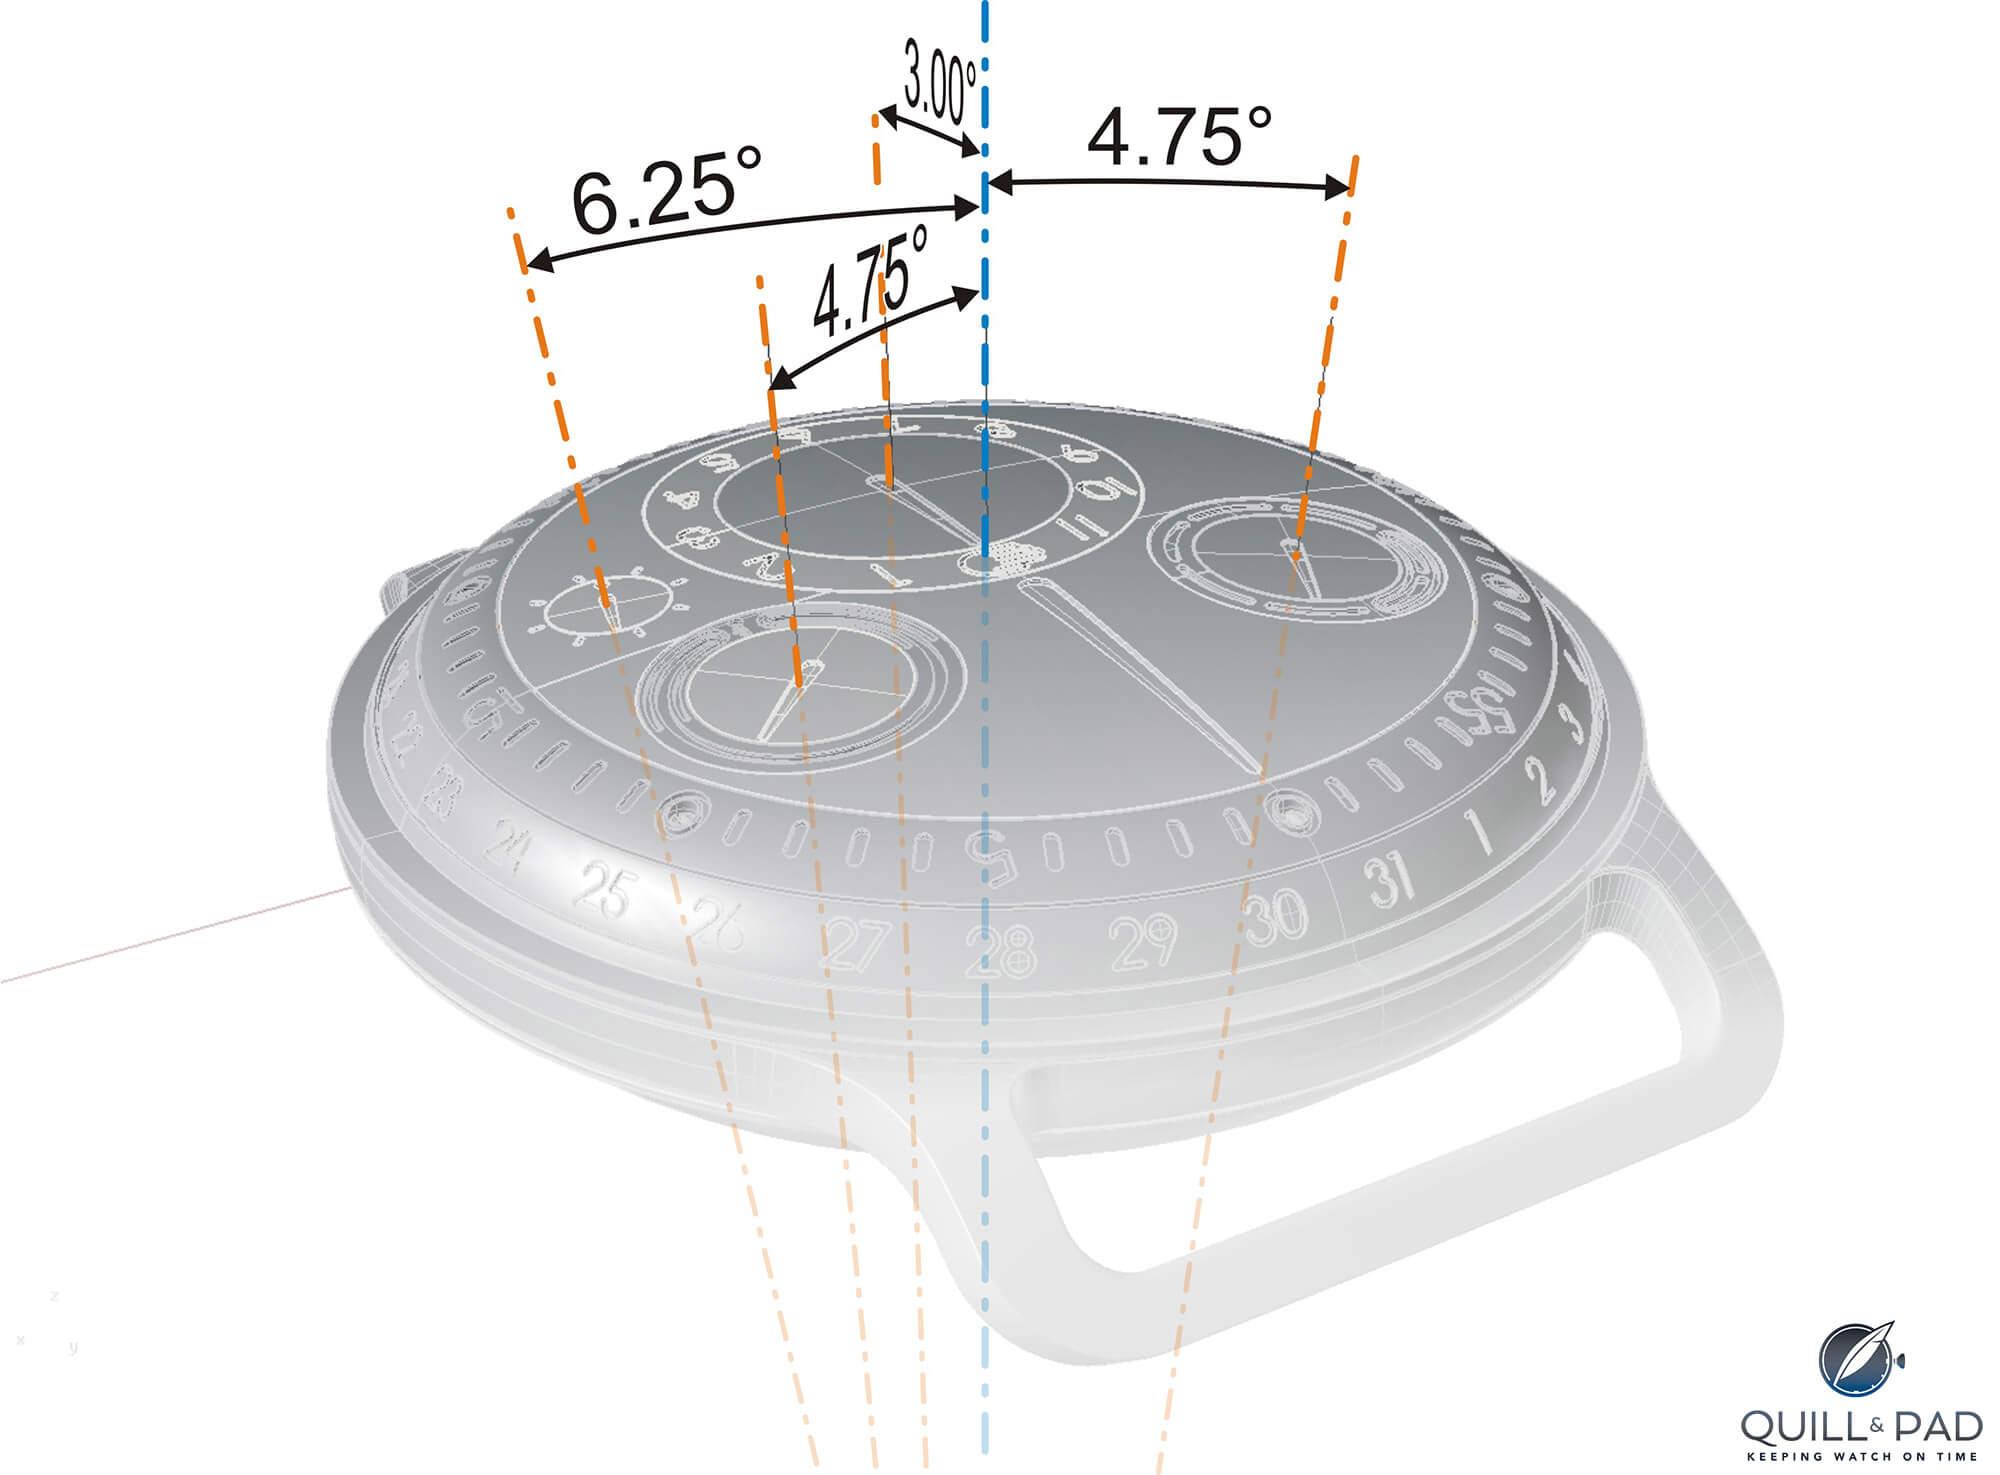 Ressence Type 2 e-Crown ROCS display angles